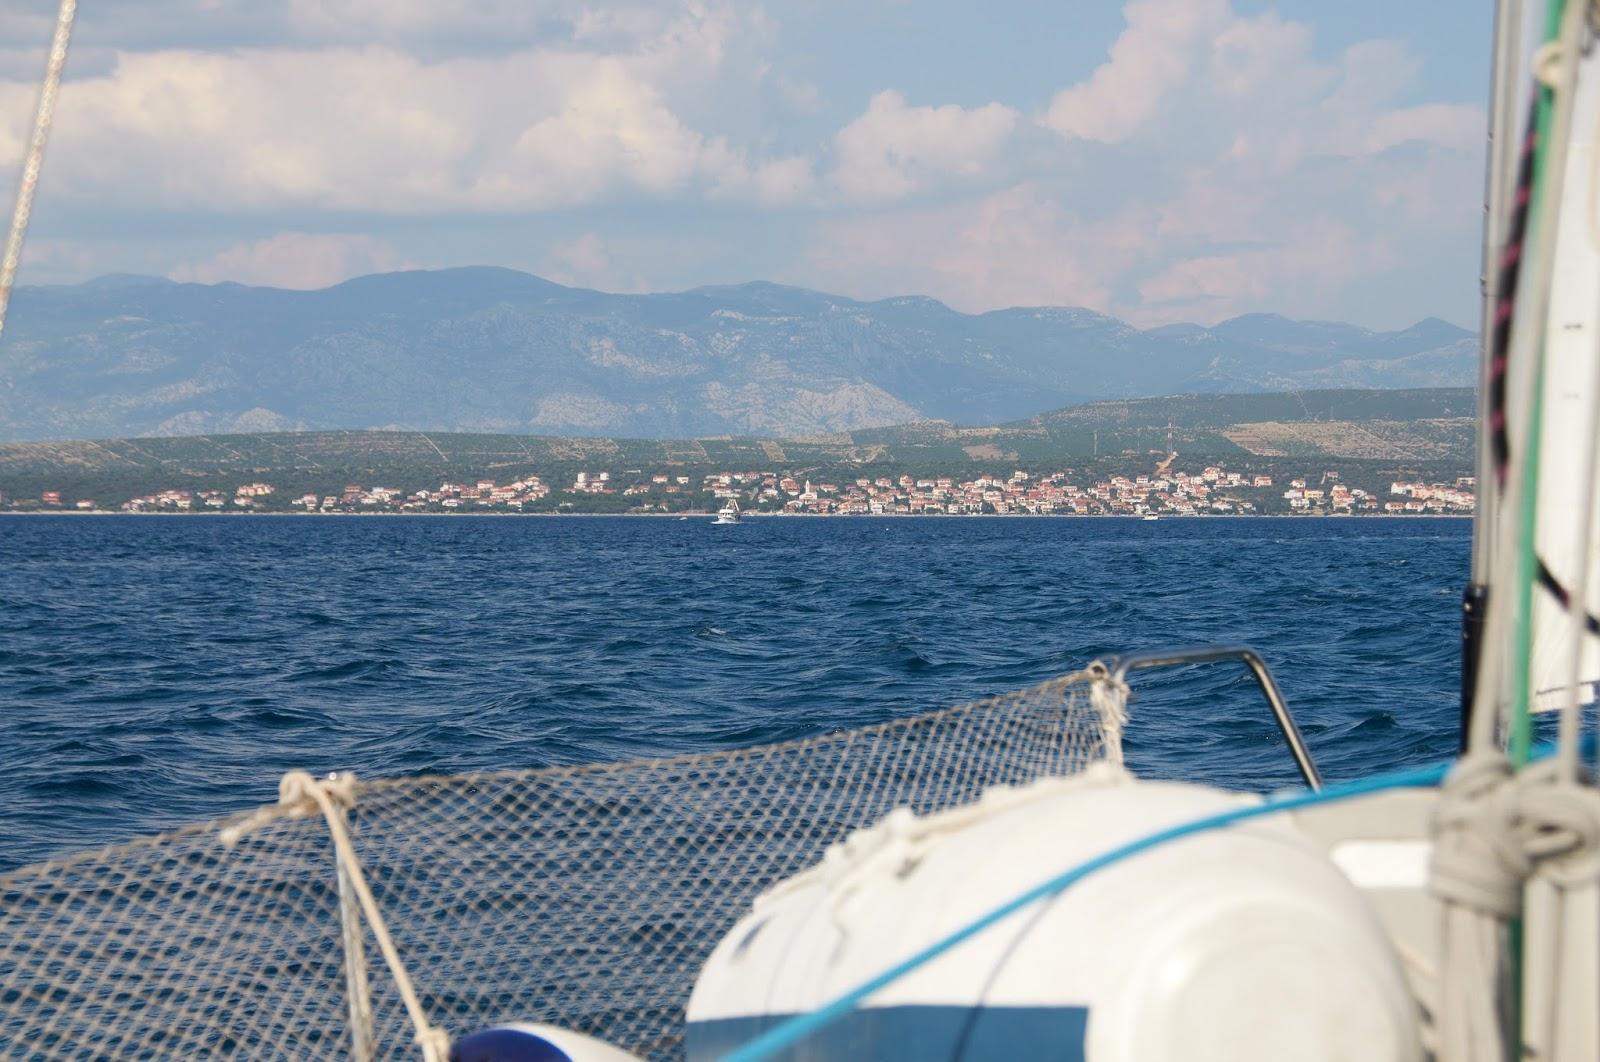 widok na wyspę Pag z morza